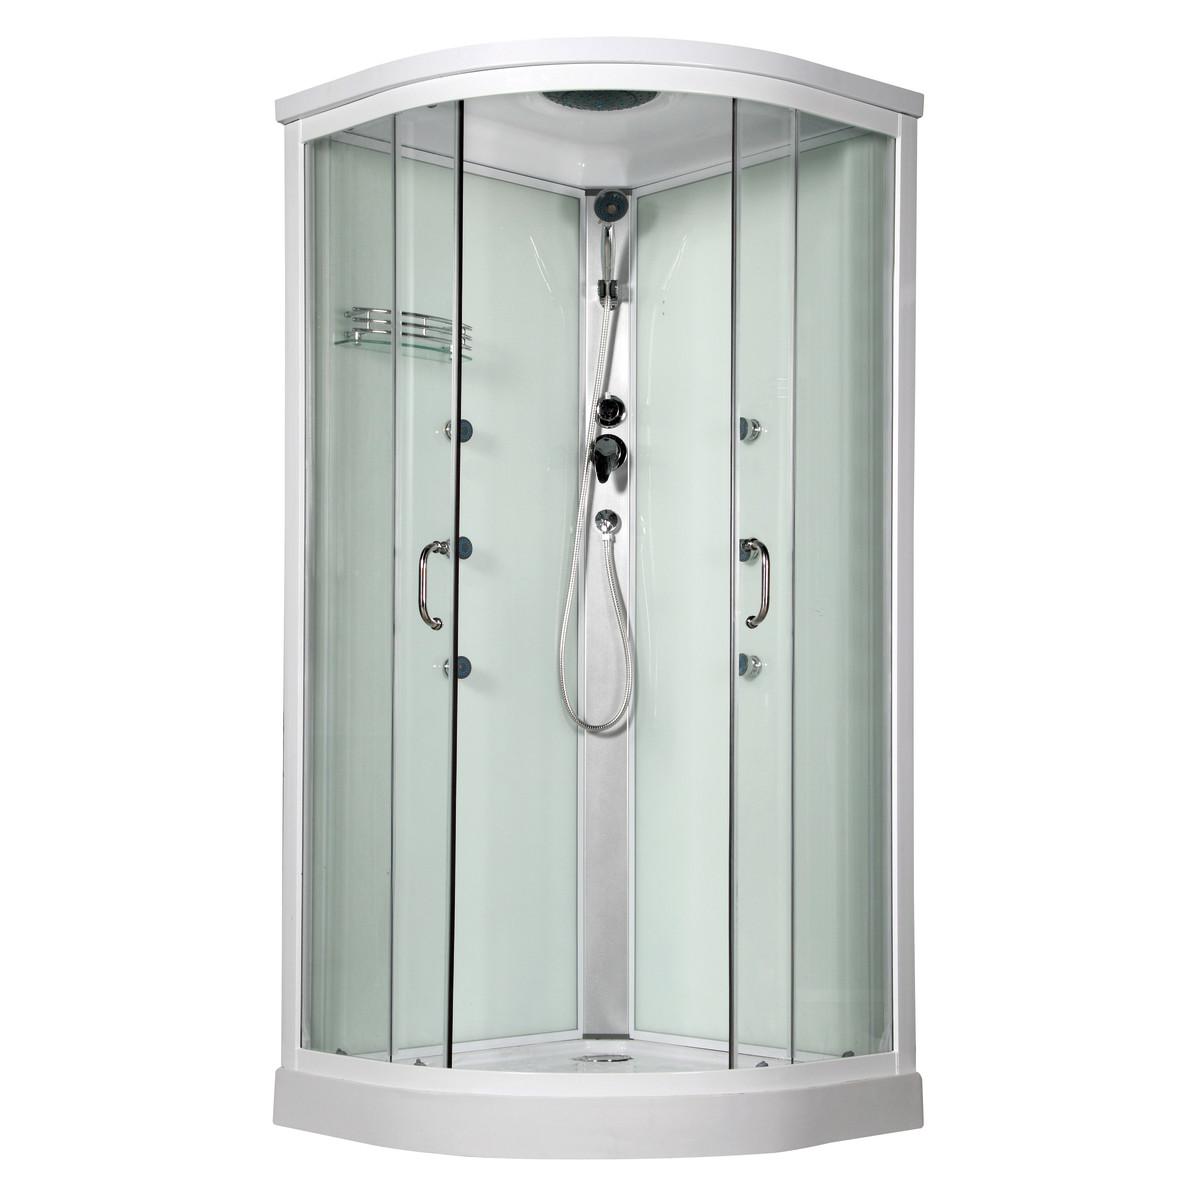 Doccia vasca prezzi for Cabine doccia prezzi